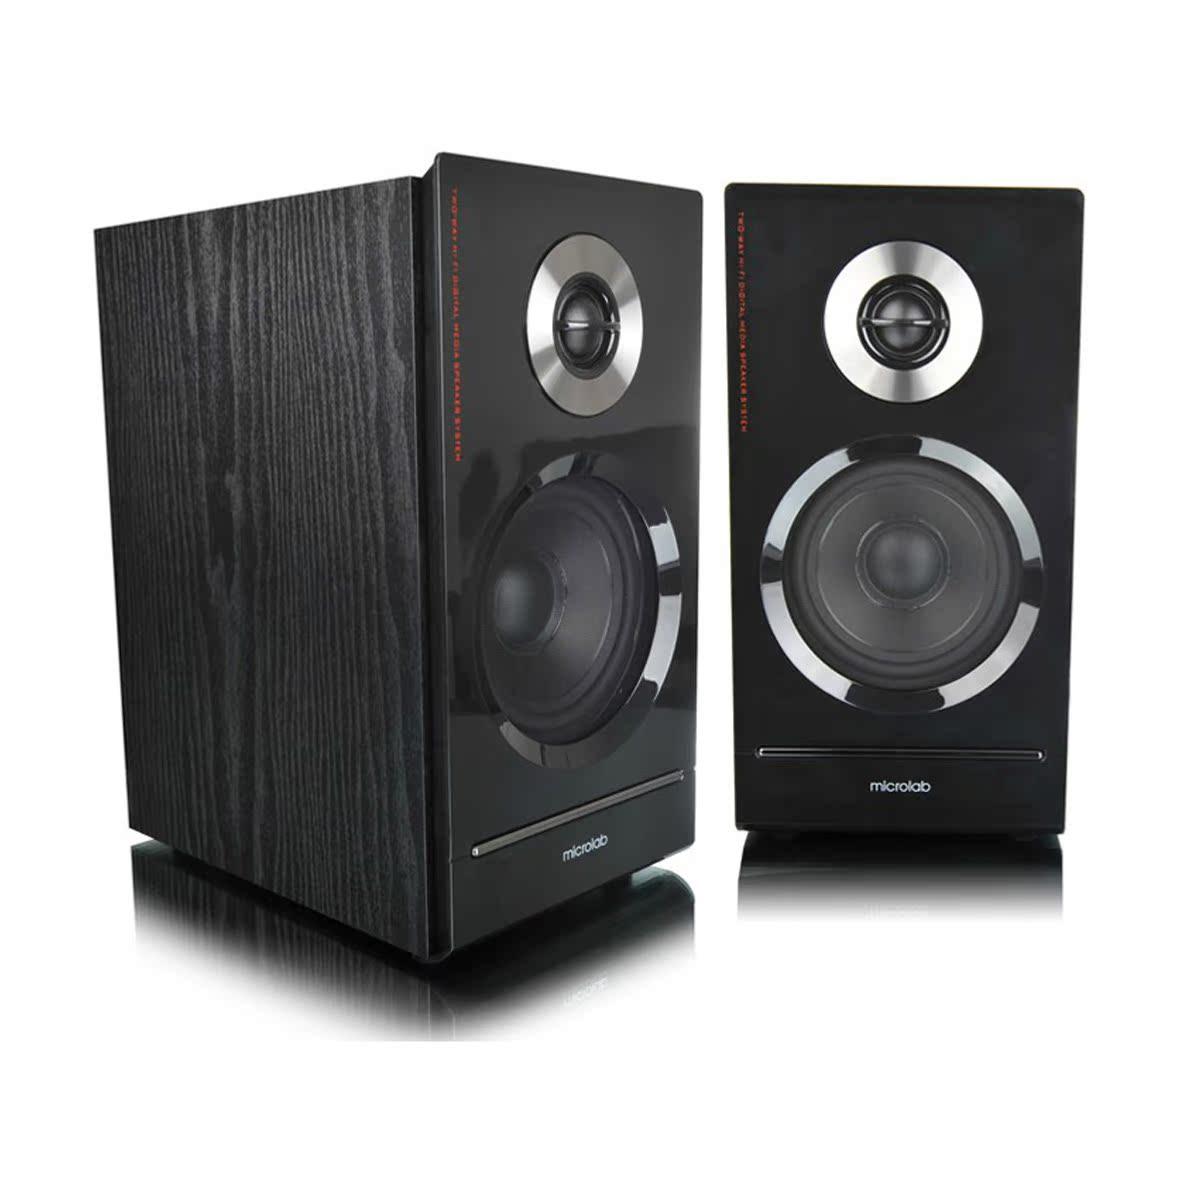 Мультимедийная акустика Microlab FC260 2.0 гарнитура microlab t967bt